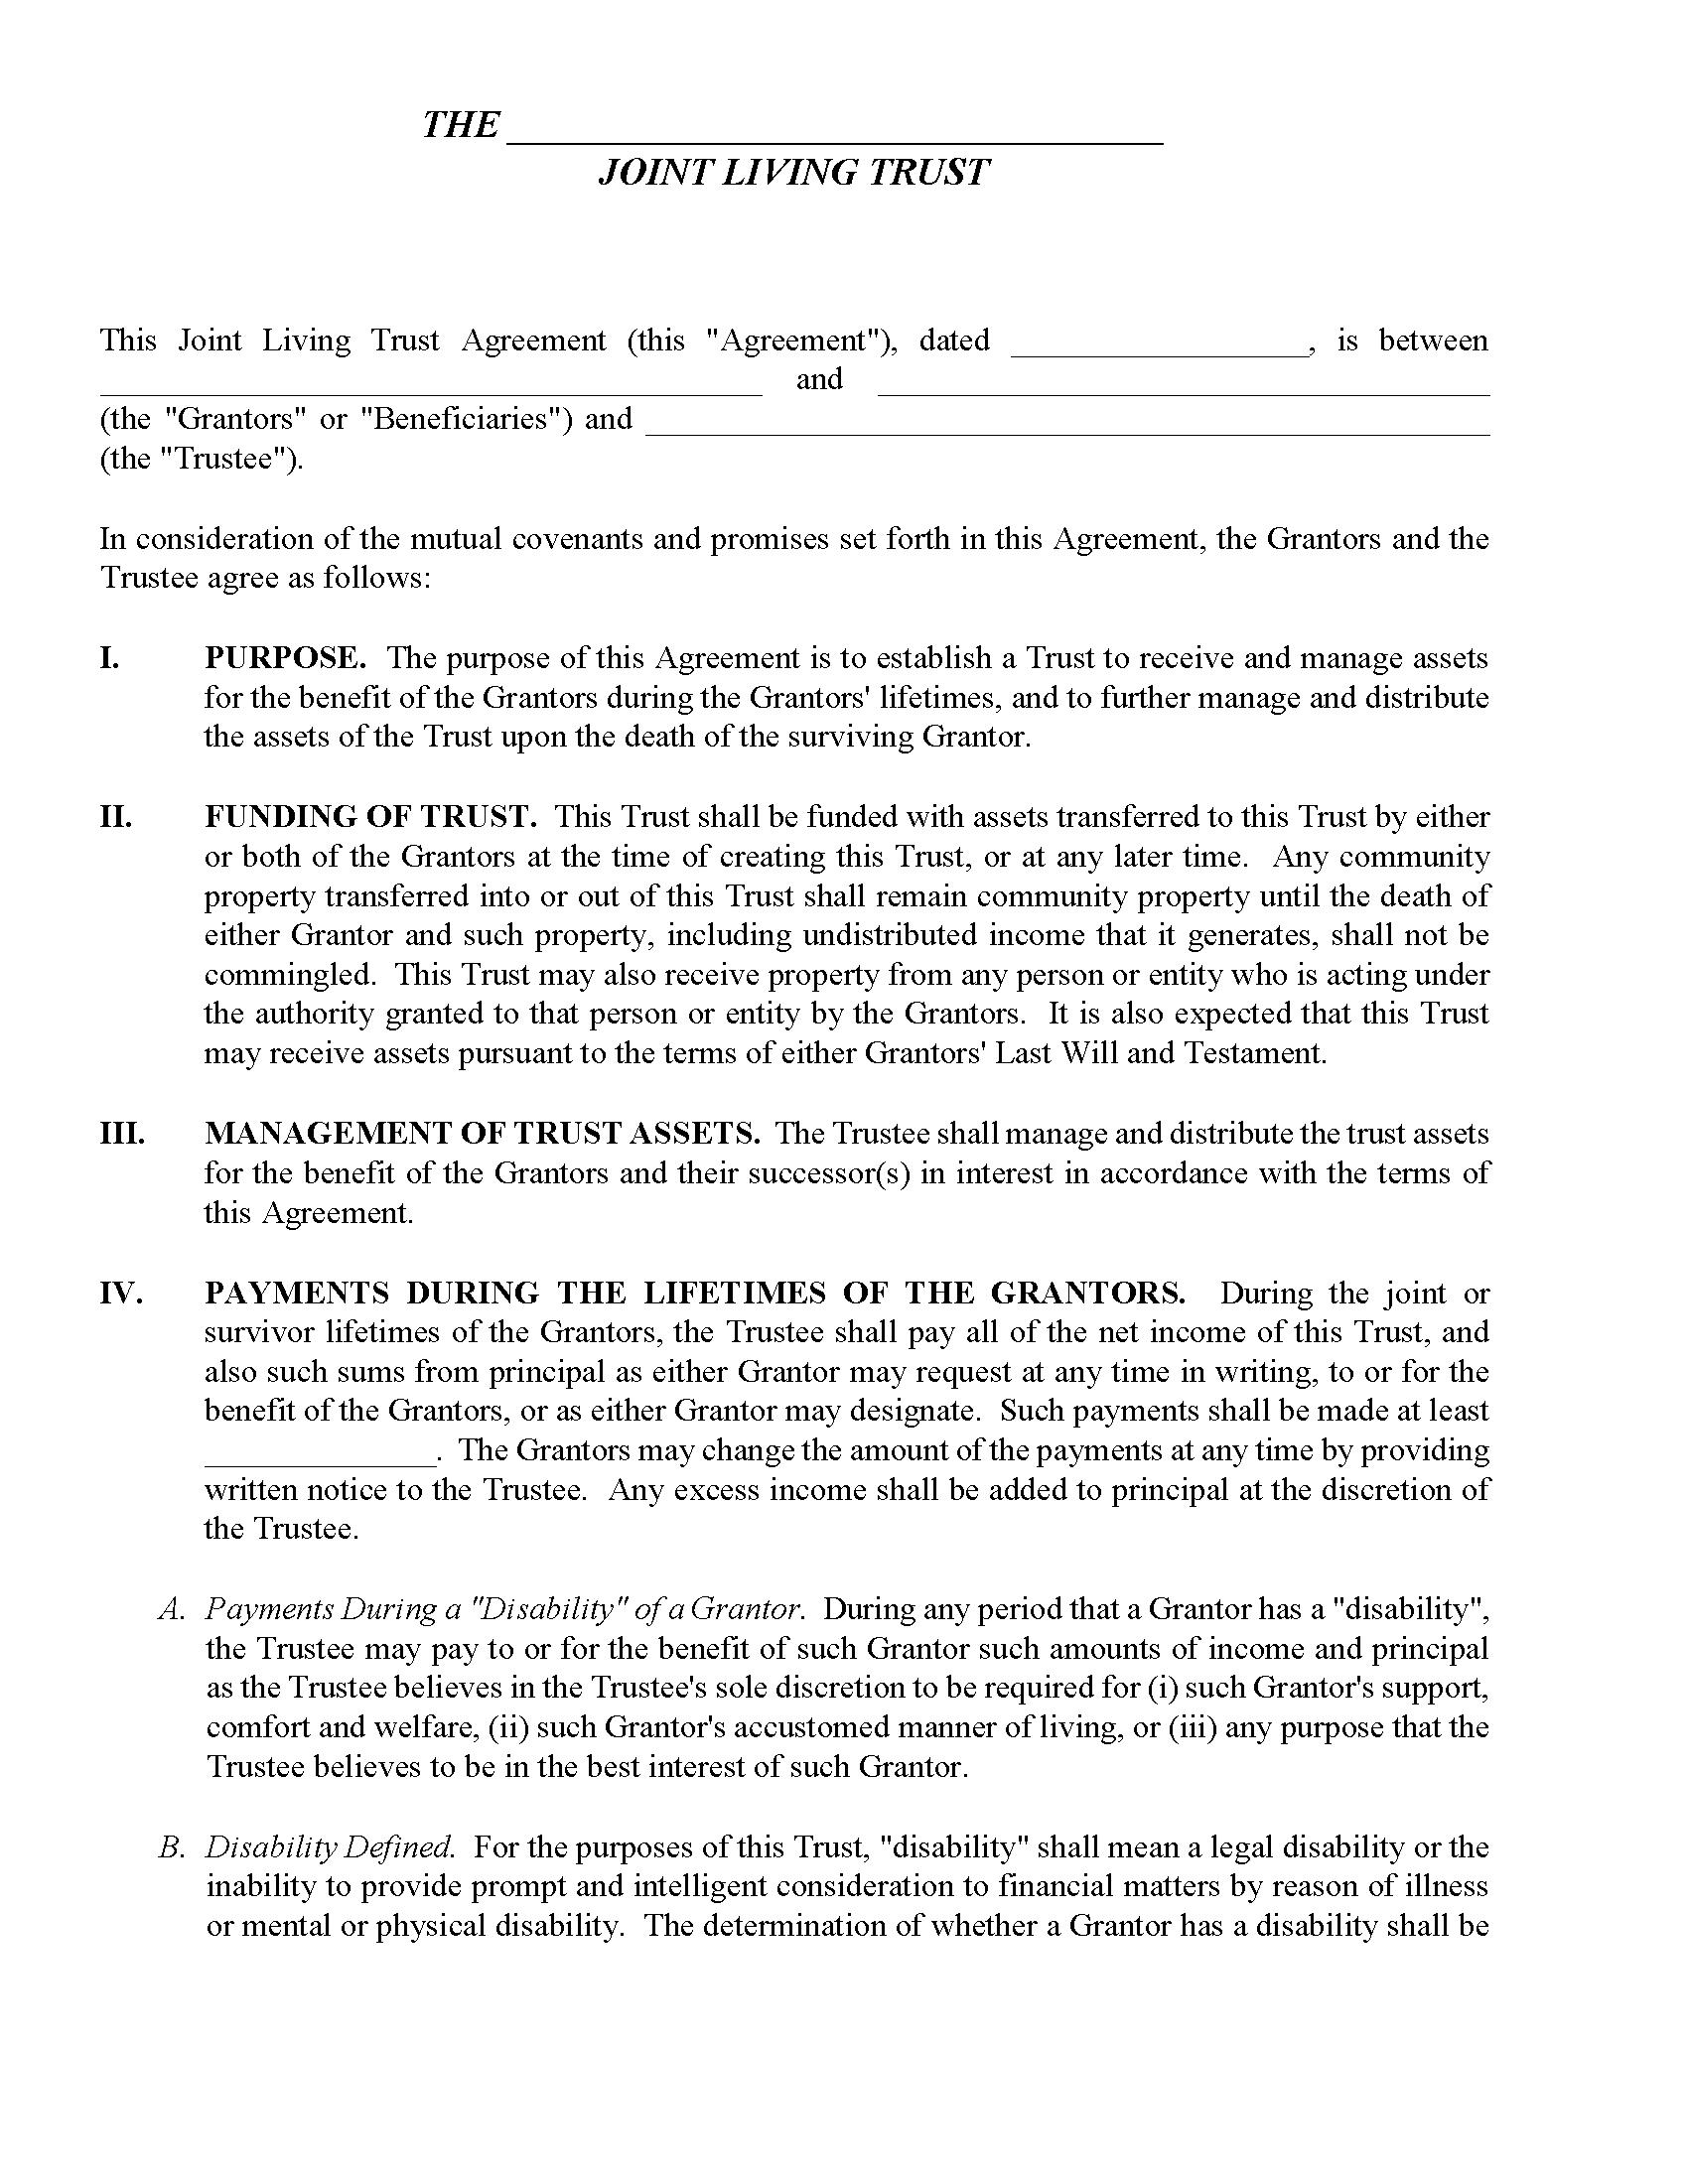 Louisiana Joint Living Trust Form